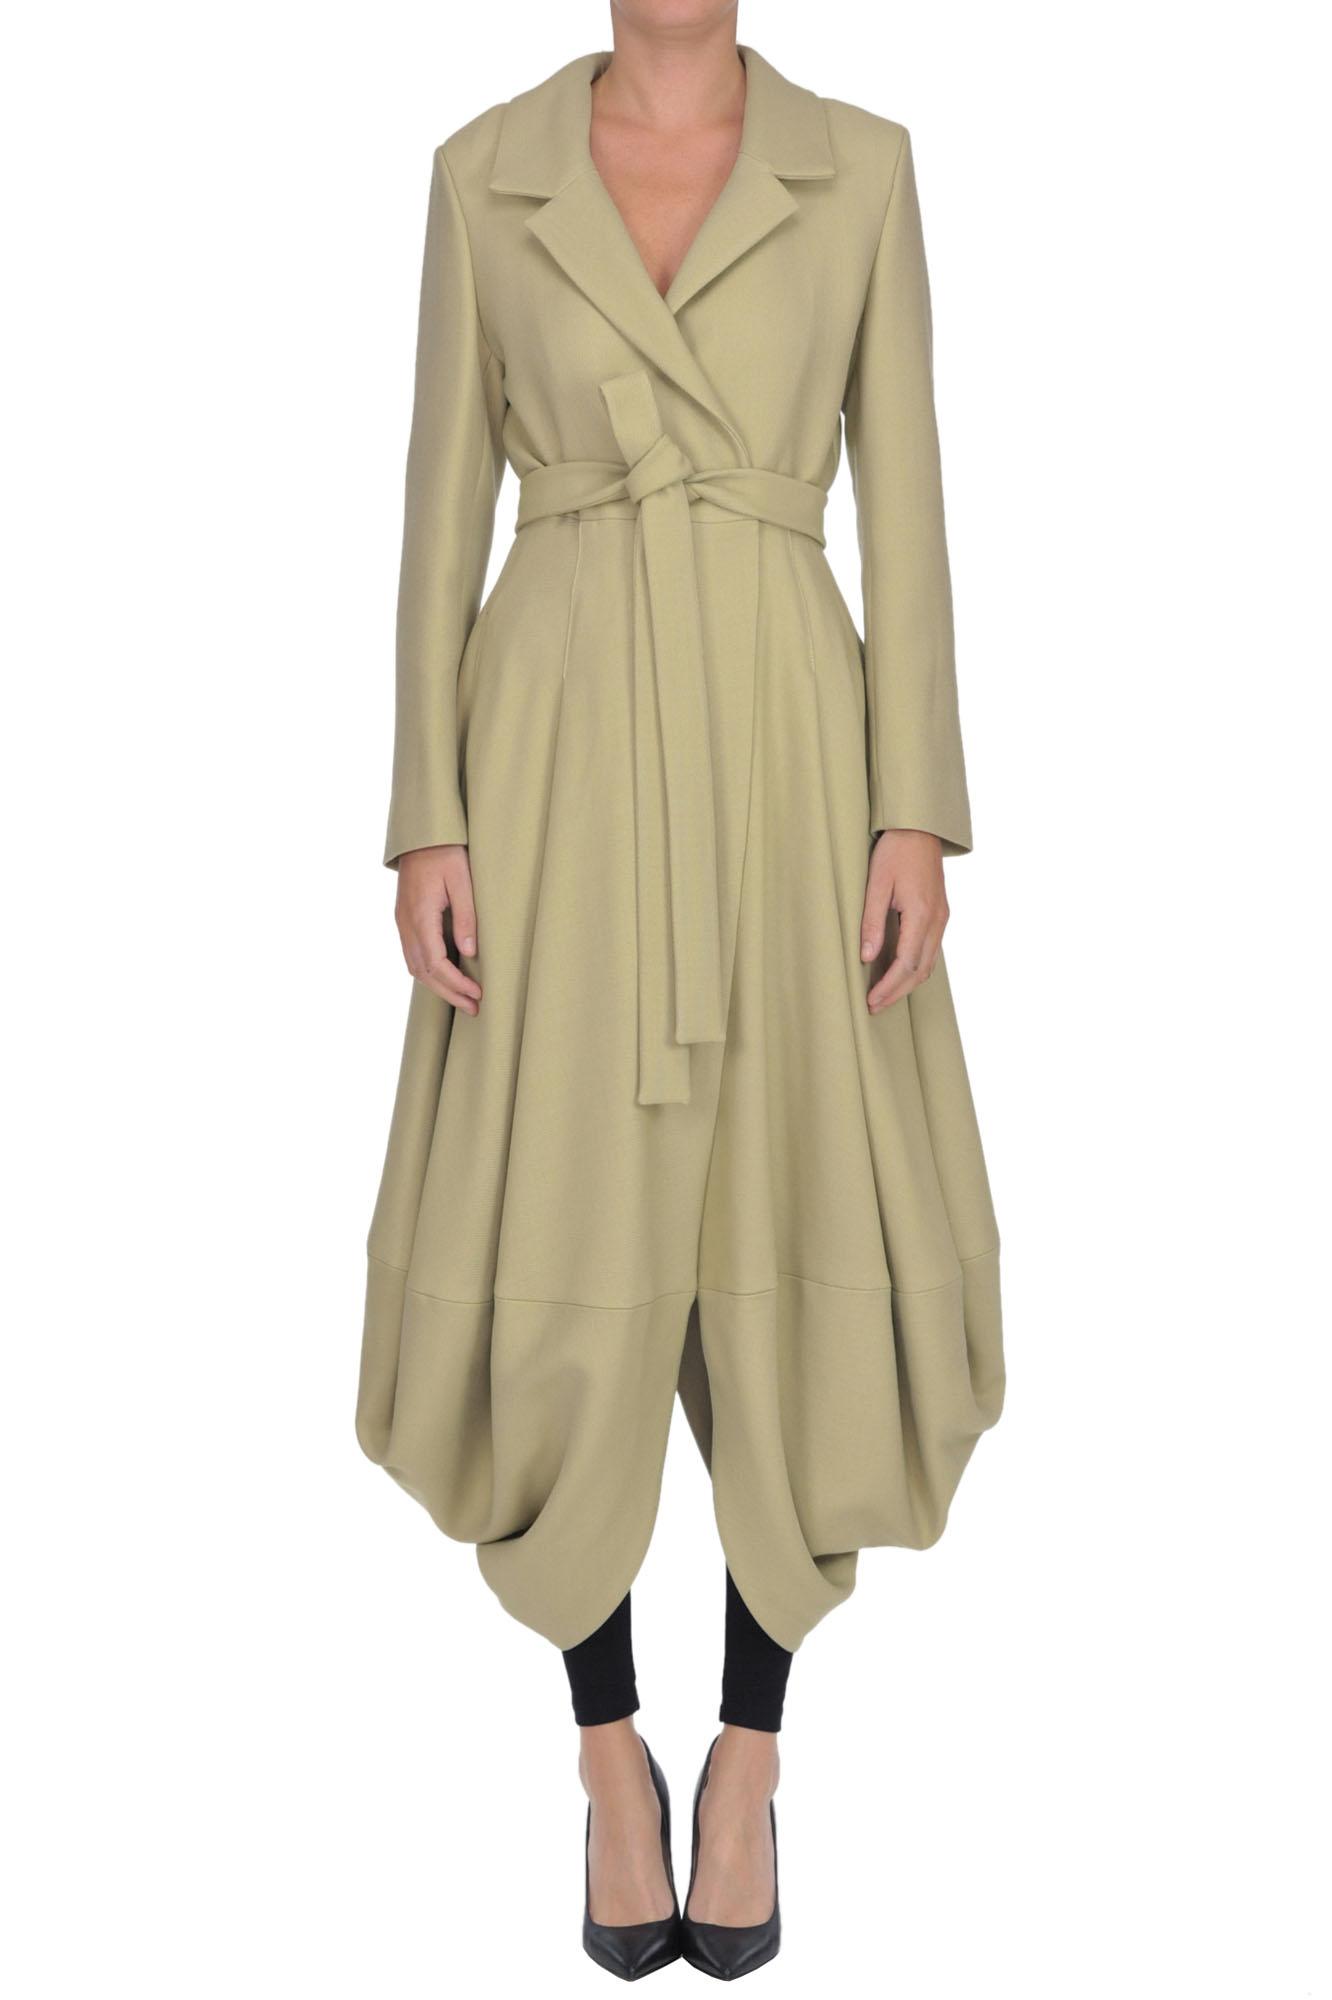 Jacquemus 'Souela' Wool-Blend Coat In Beige